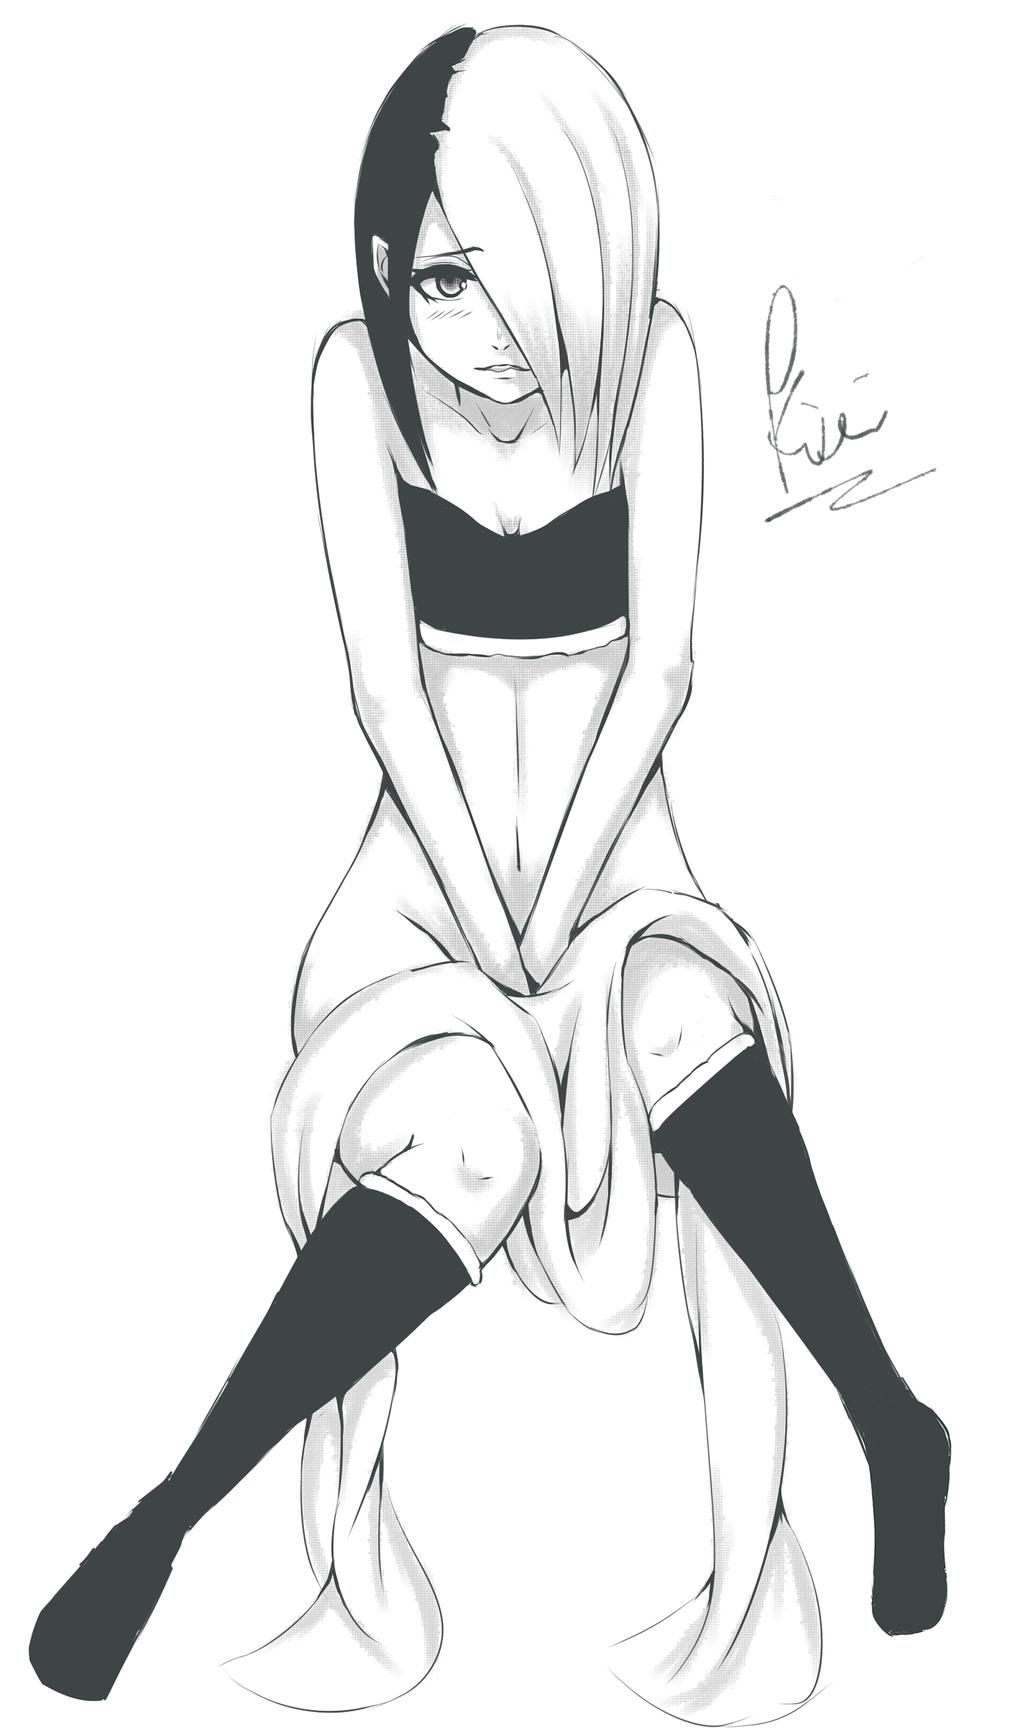 Sexy manga girl by kiritzugu